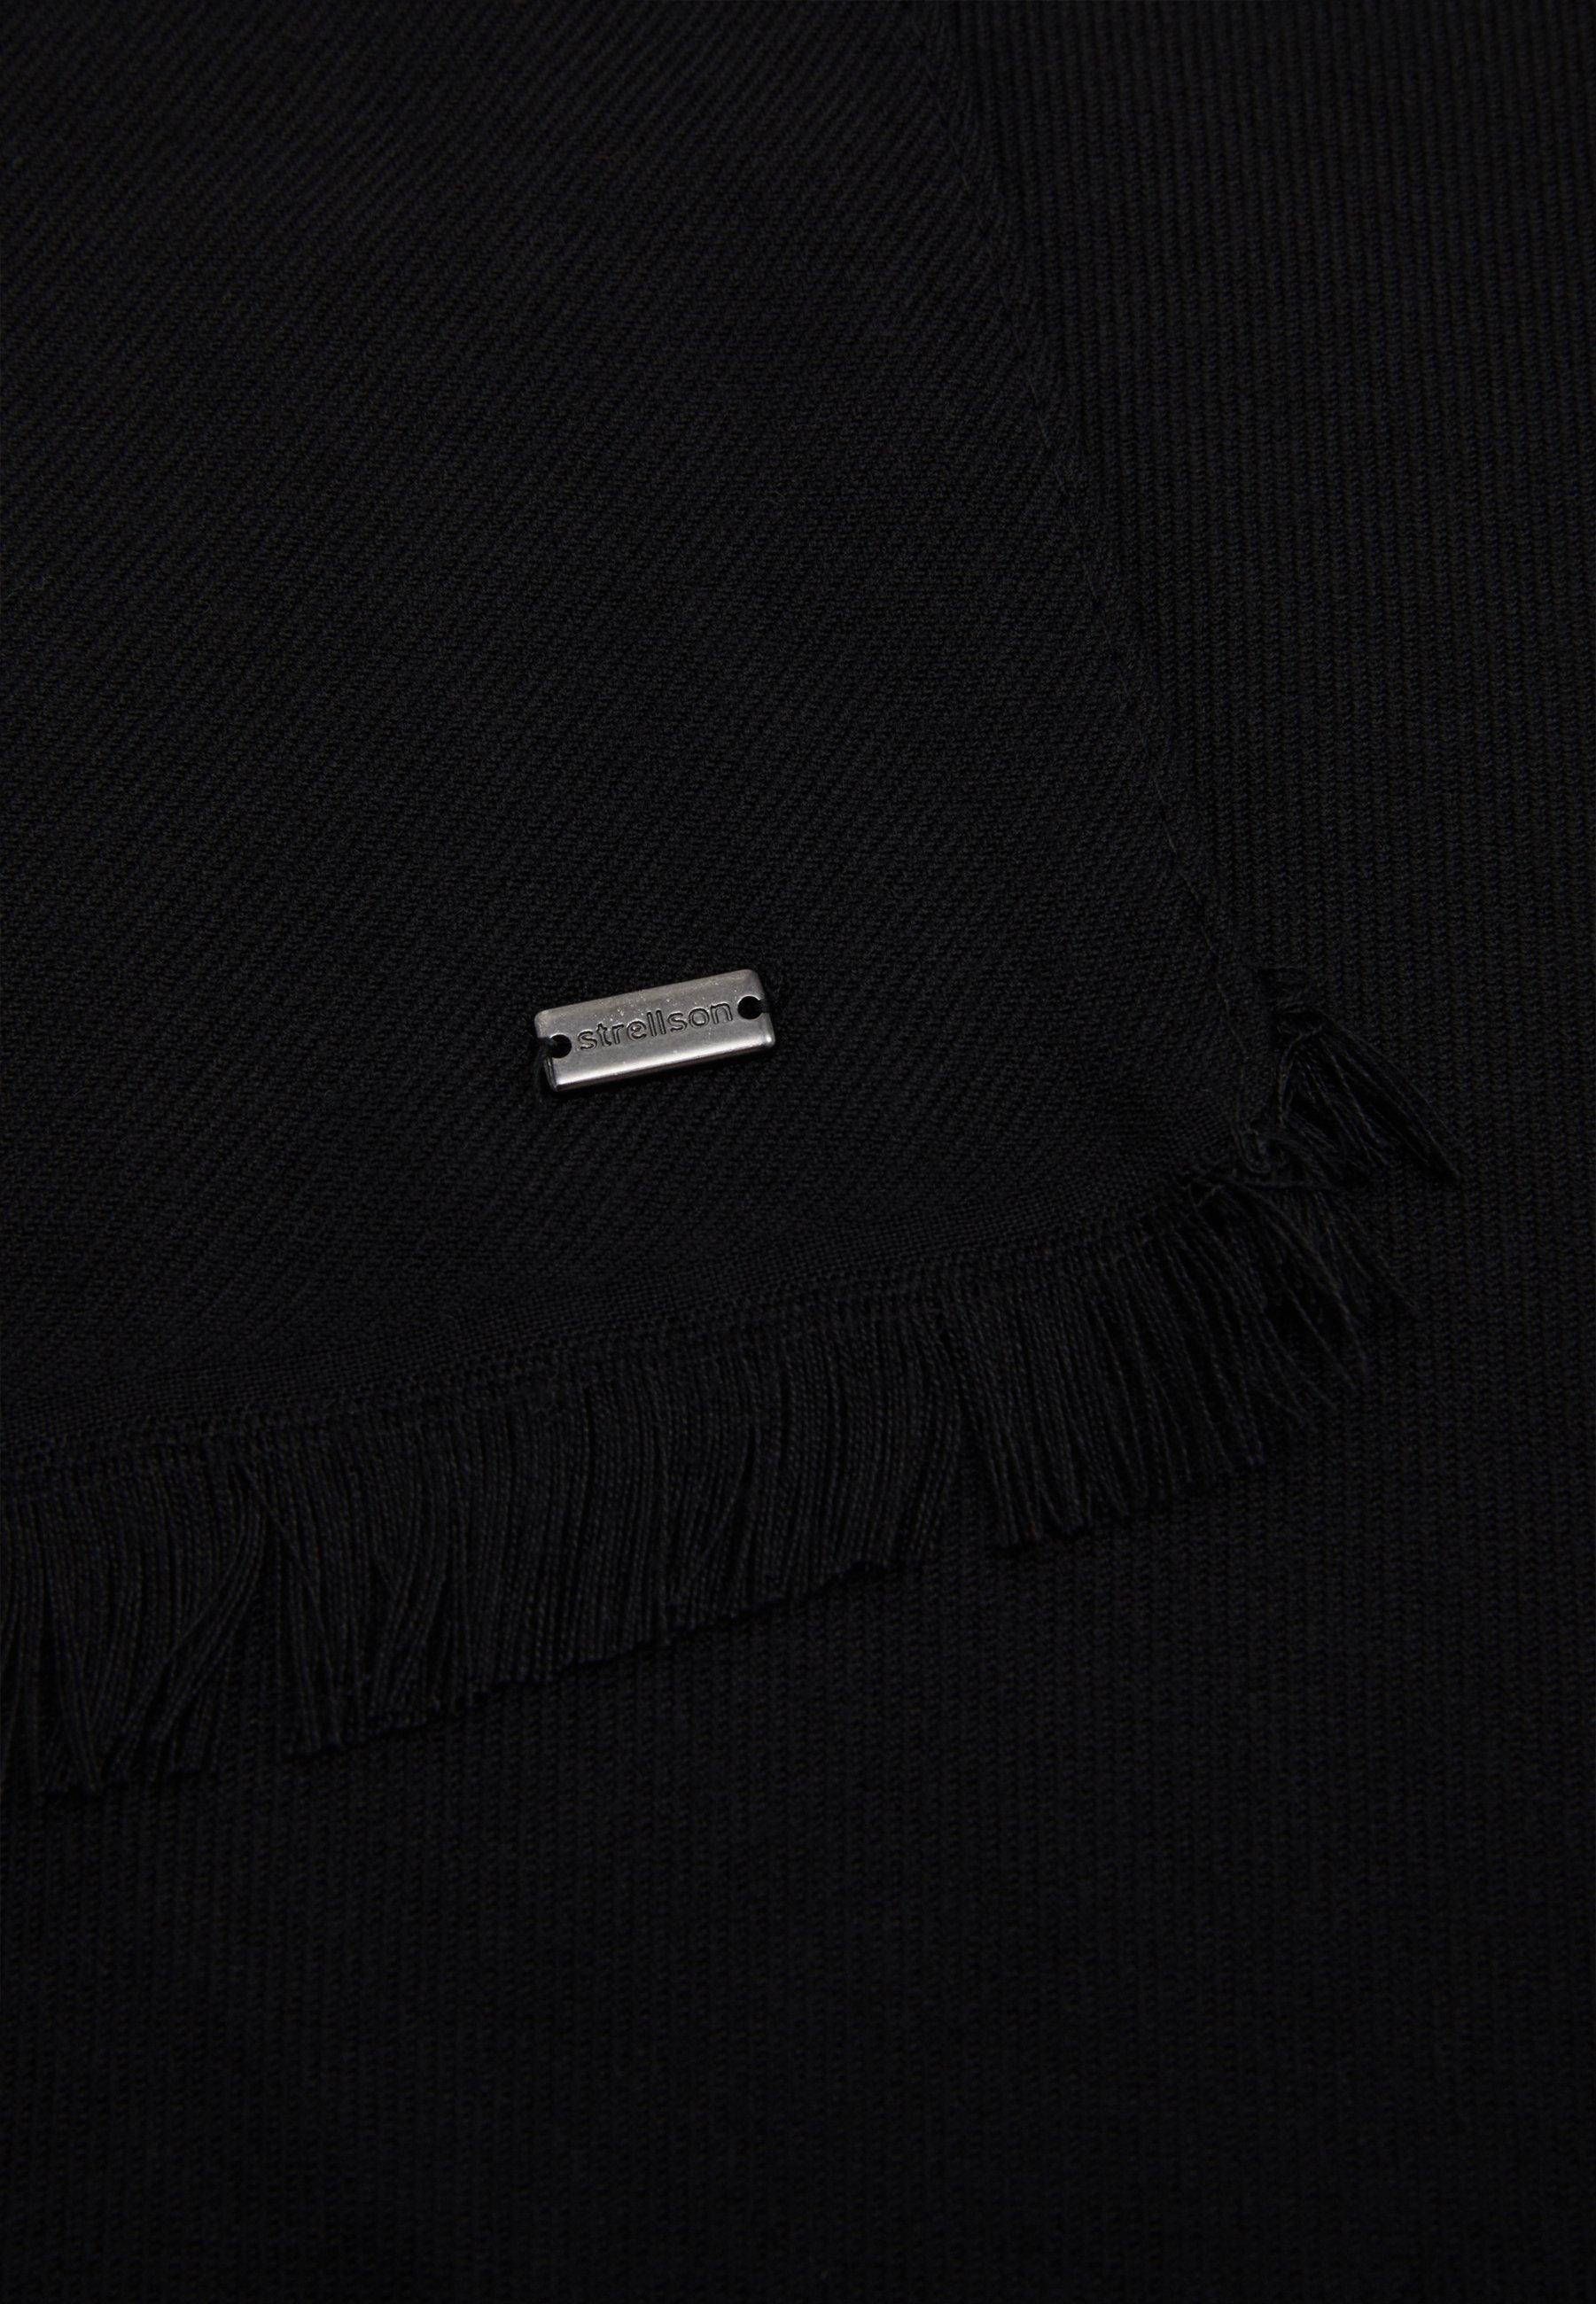 Strellson DORIAN SCARF - Schal - black/schwarz - Herrenaccessoires mGyqH